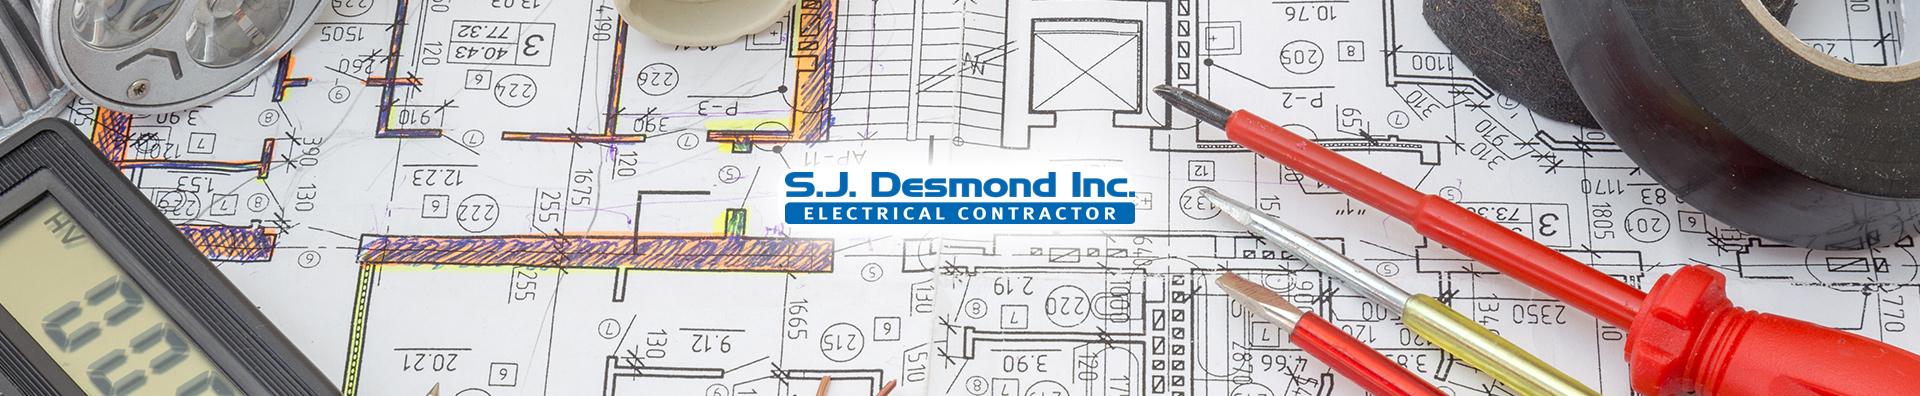 Desmond Electrical